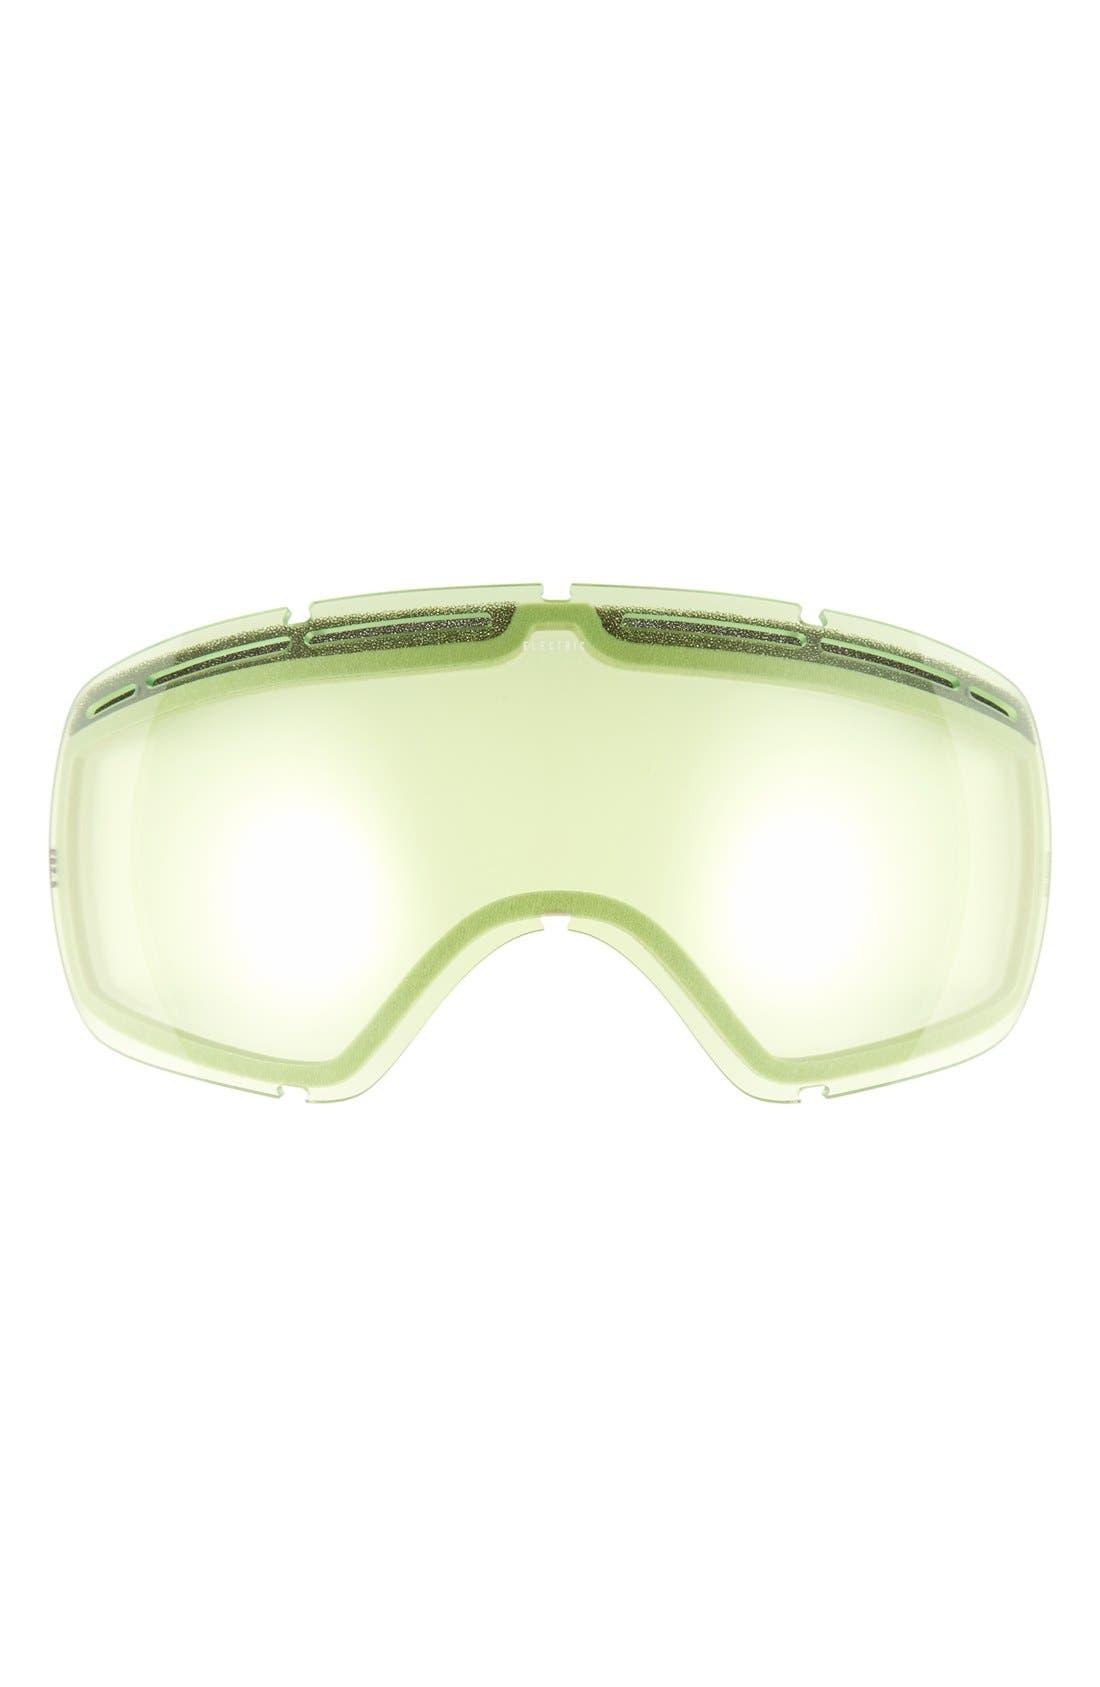 EG 2.5 215mm Snow Goggles,                             Alternate thumbnail 3, color,                             Solid Berry/ Jet Black